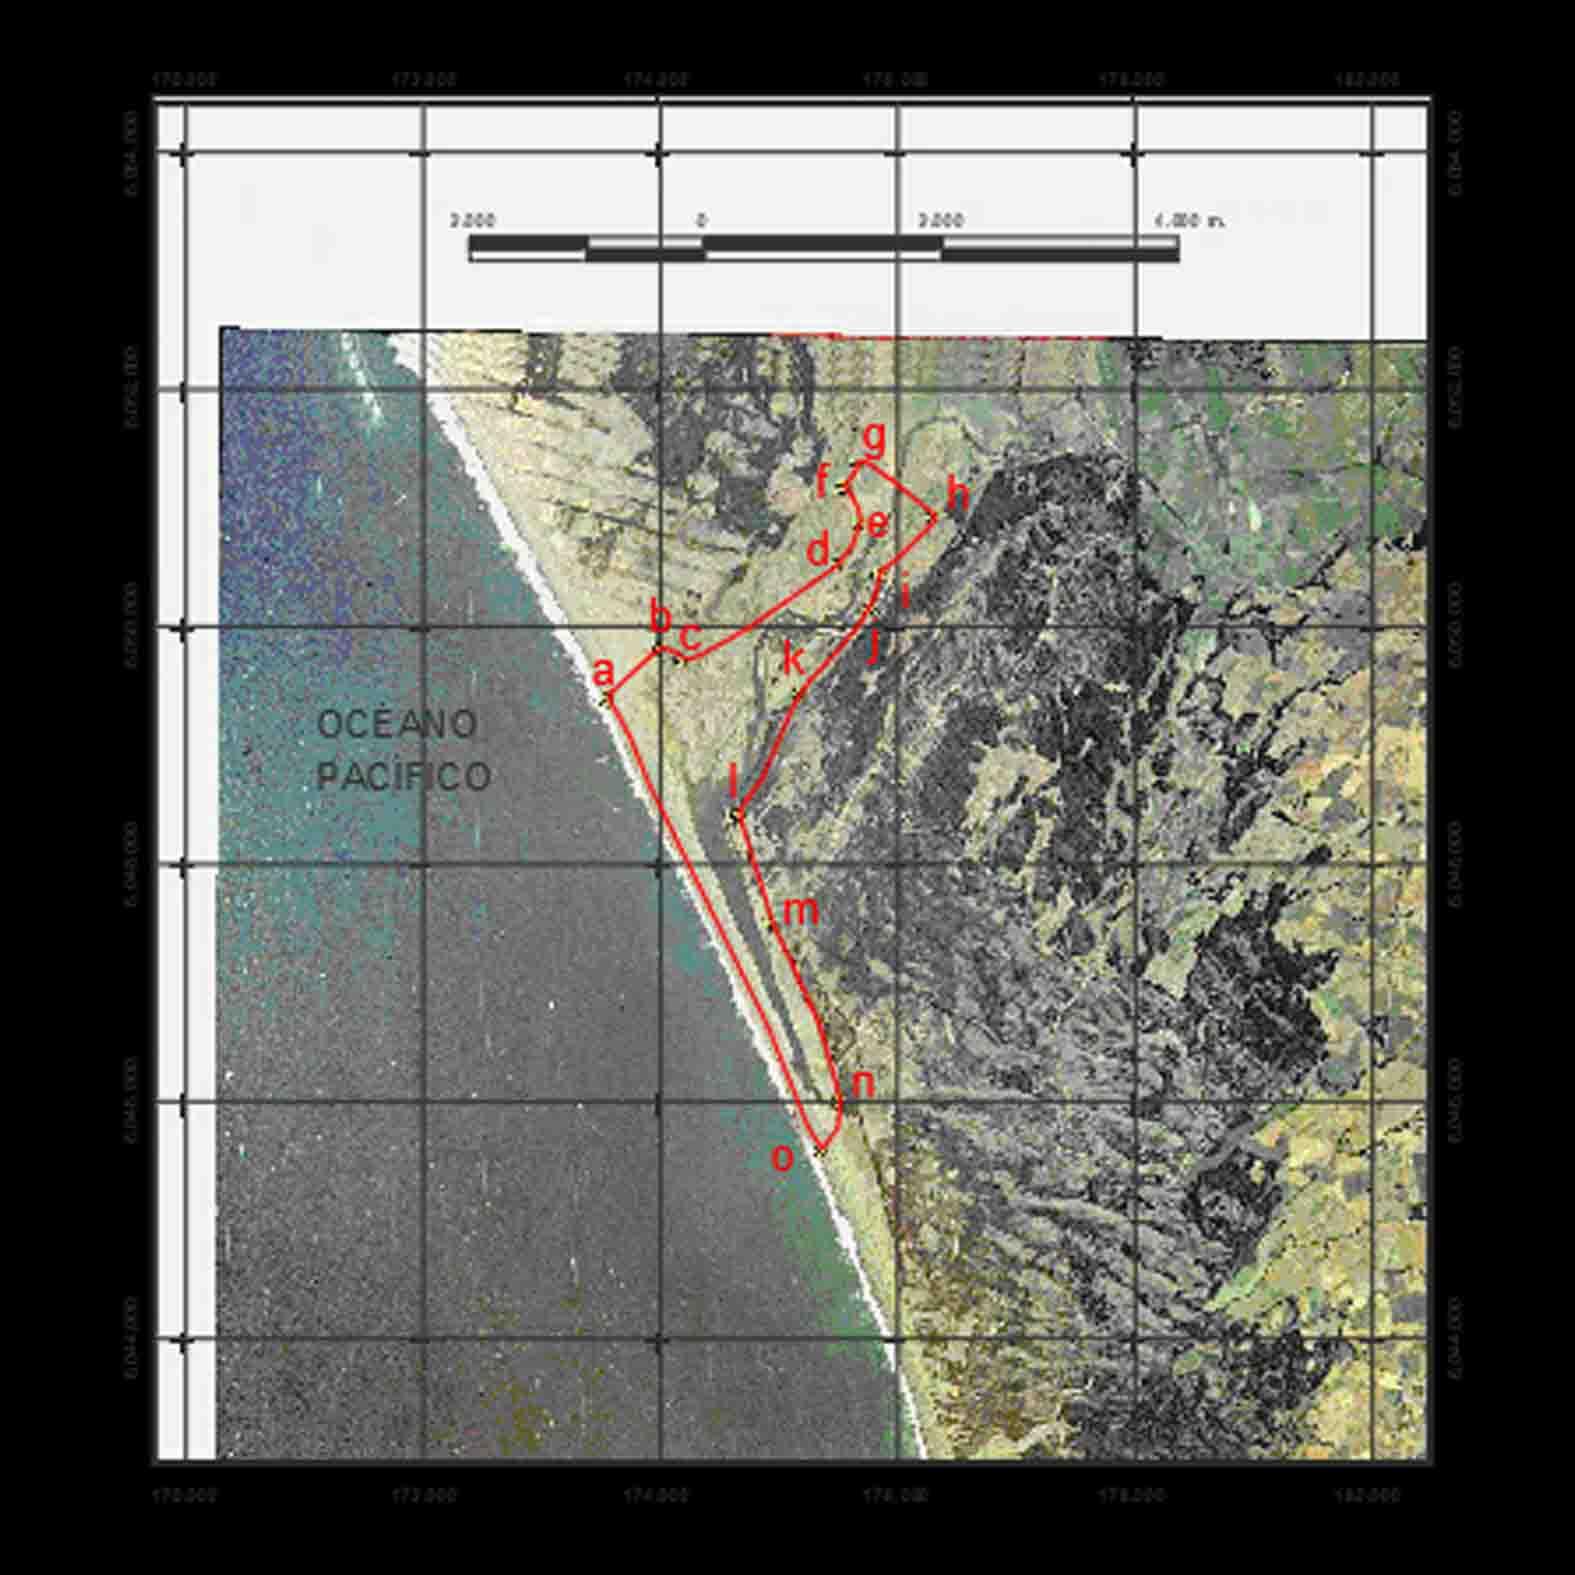 Plano: Humedal de Reloca / Chanco